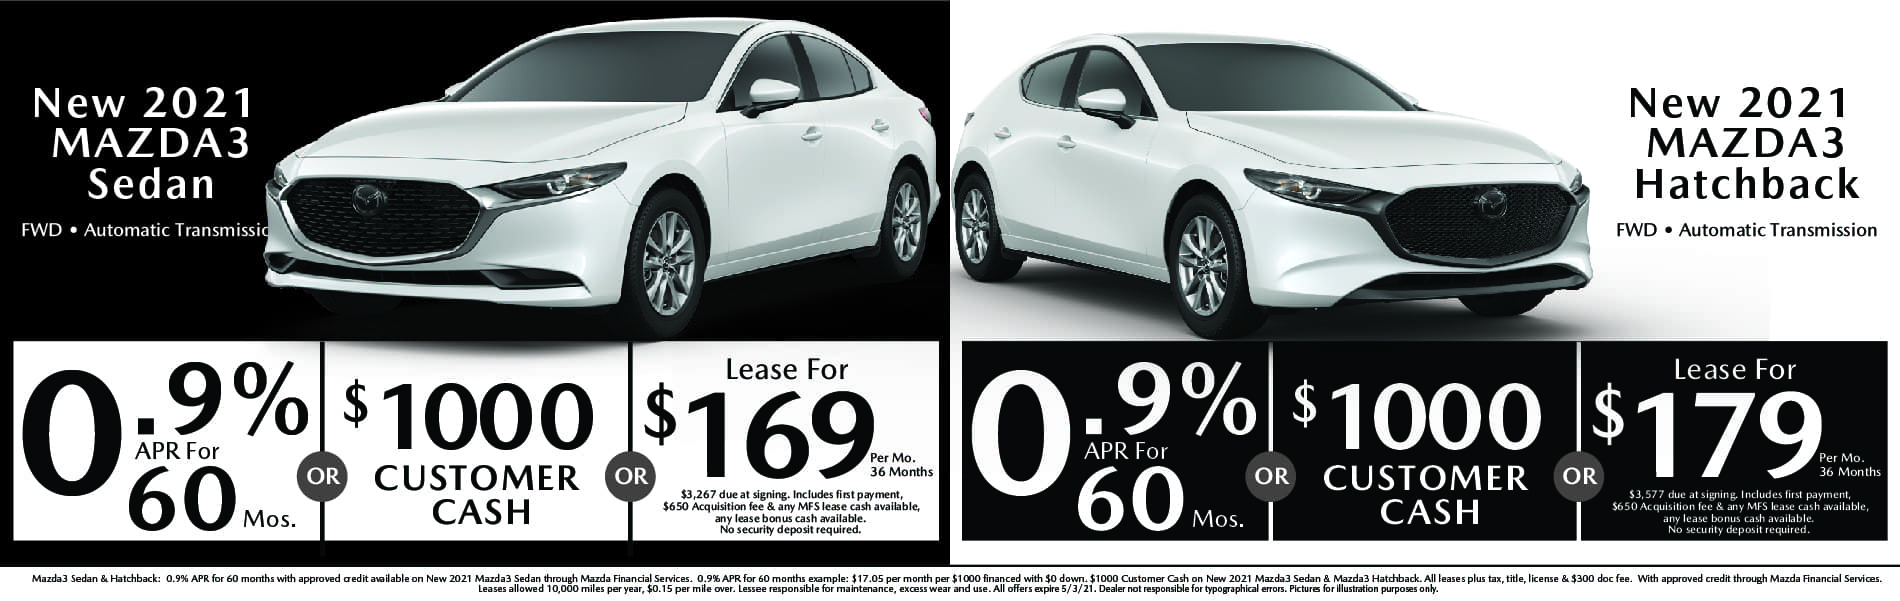 New Mazda3 APR & Lease options